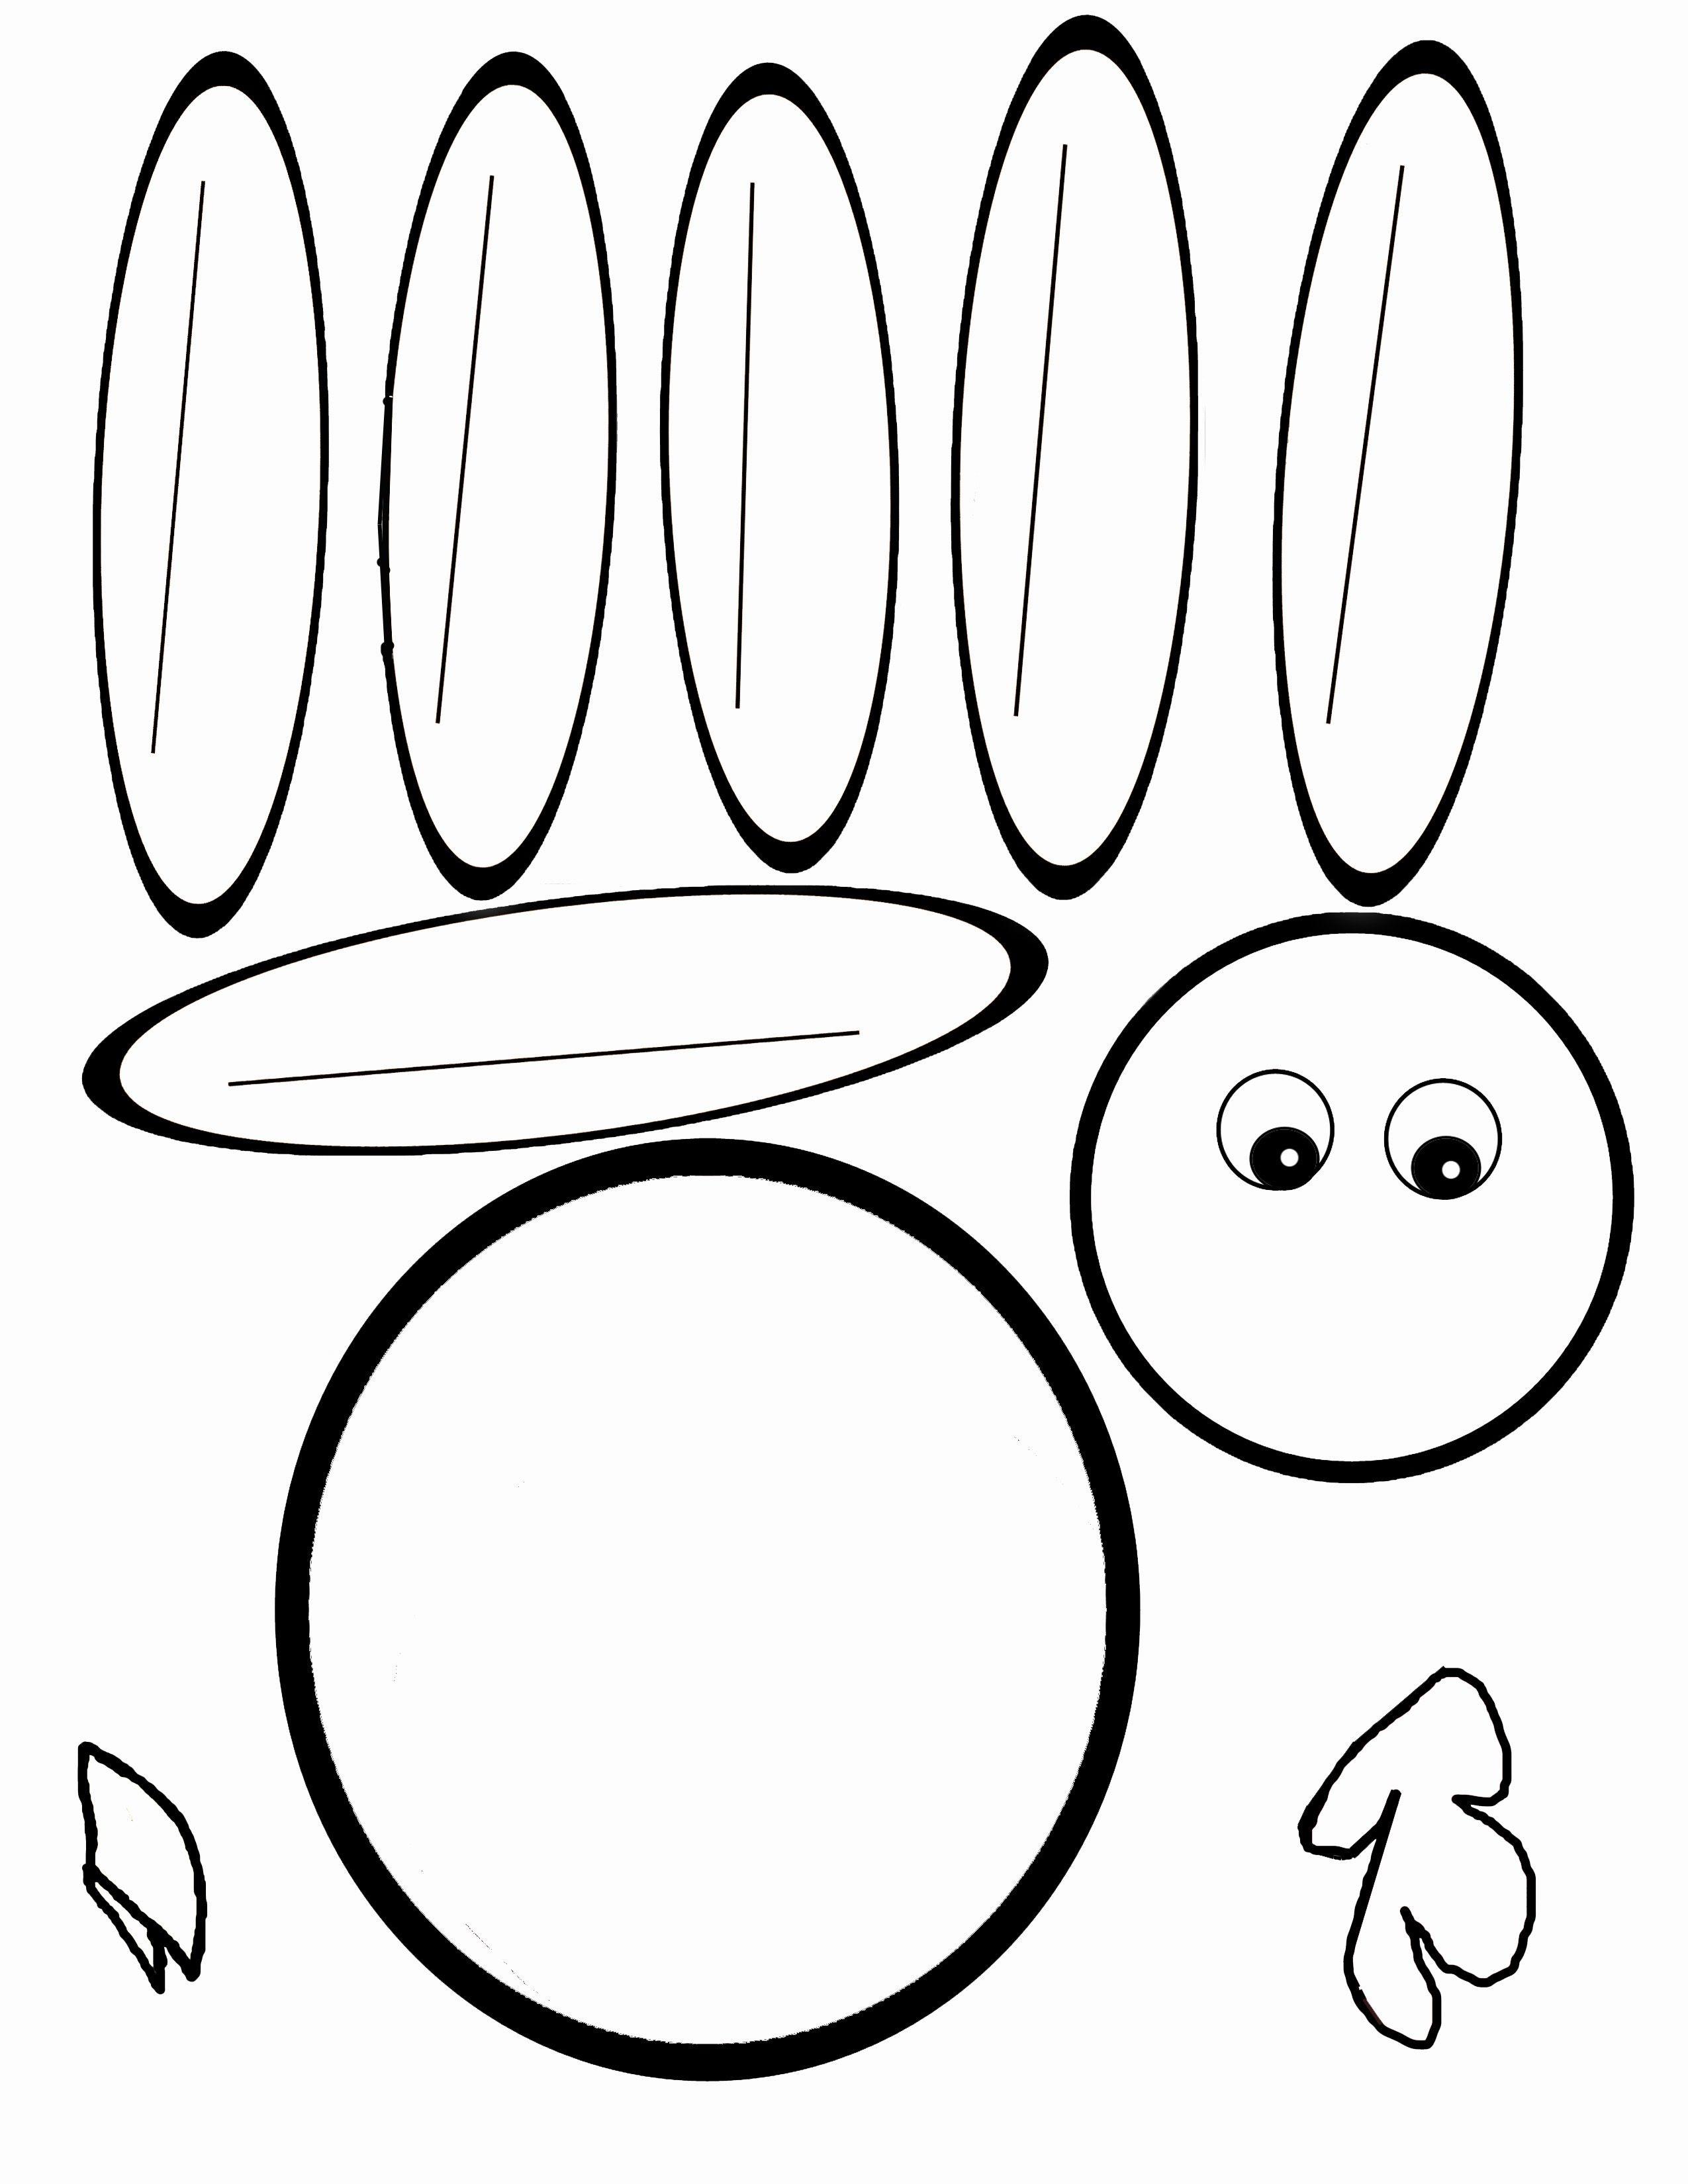 Scissor Cutting Turkey Template | Pediatric Ot | Turkey Template - Free Printable Turkey Template